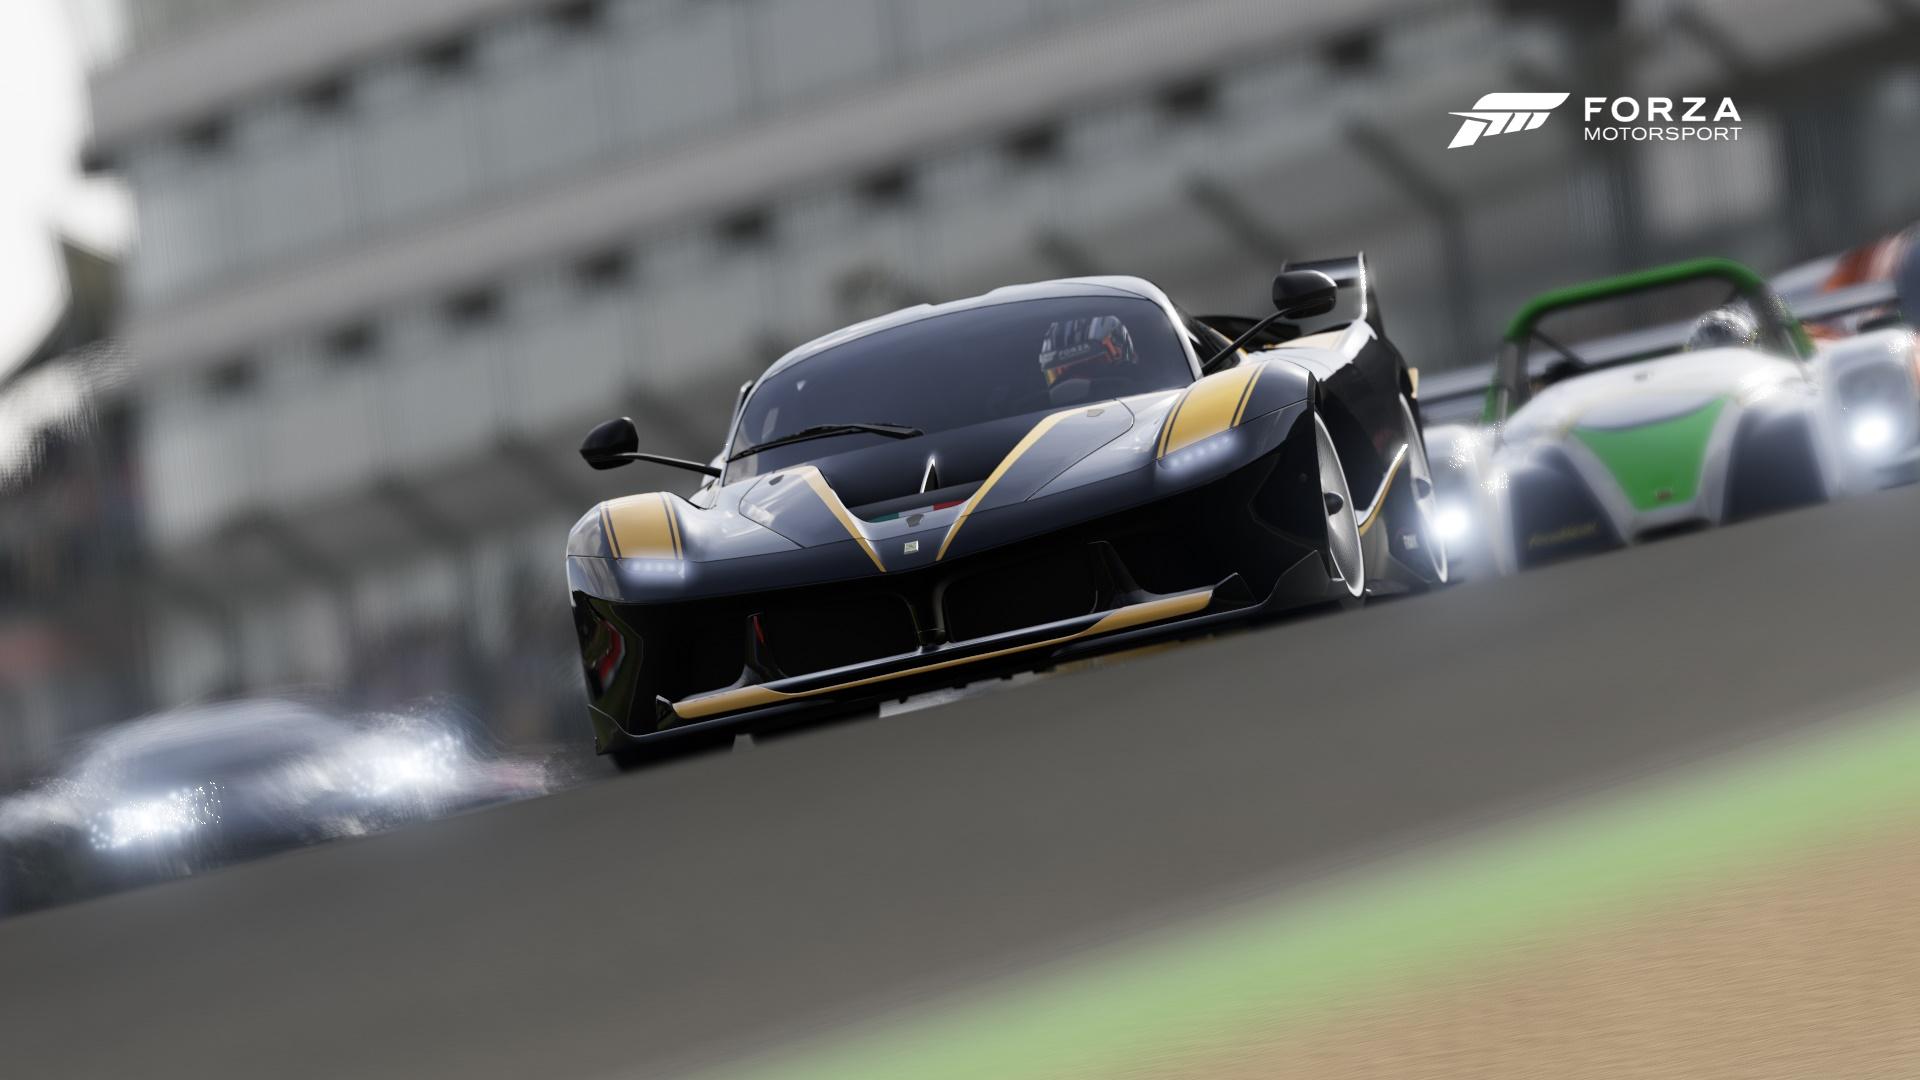 2014 Ferrari FXX K